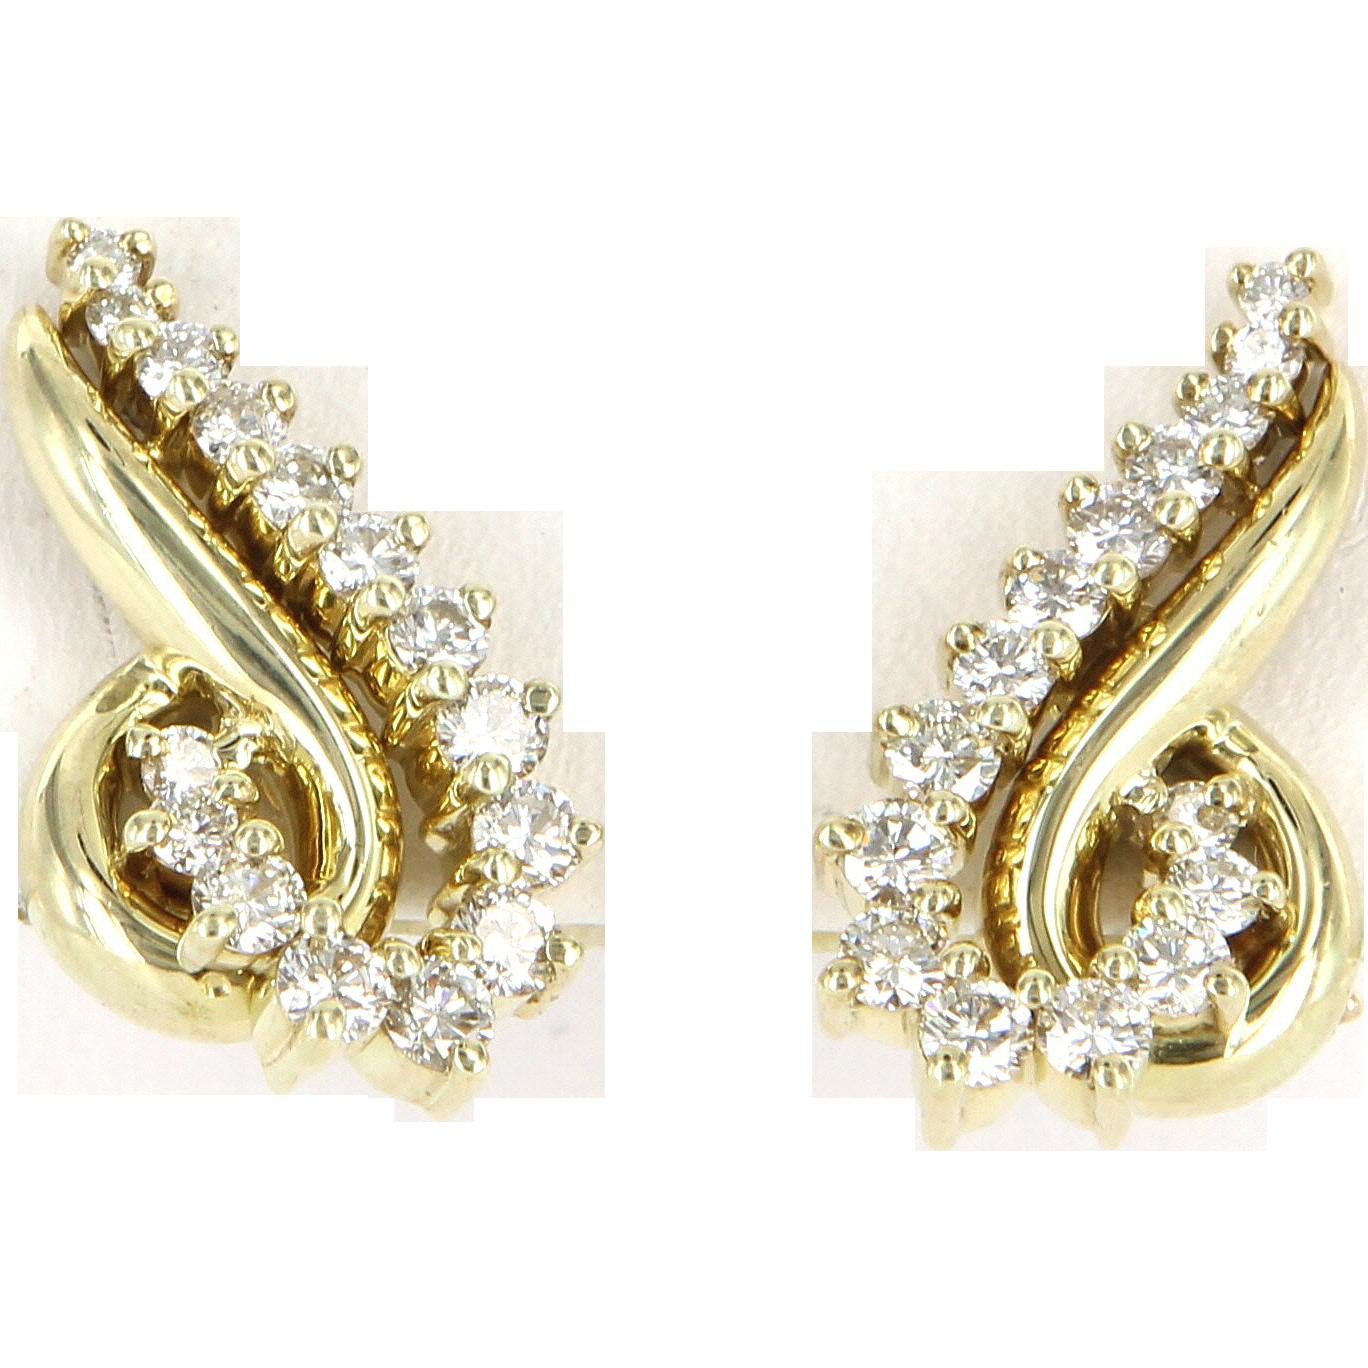 Vintage Jose Hess Diamond Clip Cocktail Earrings 14 Karat Gold